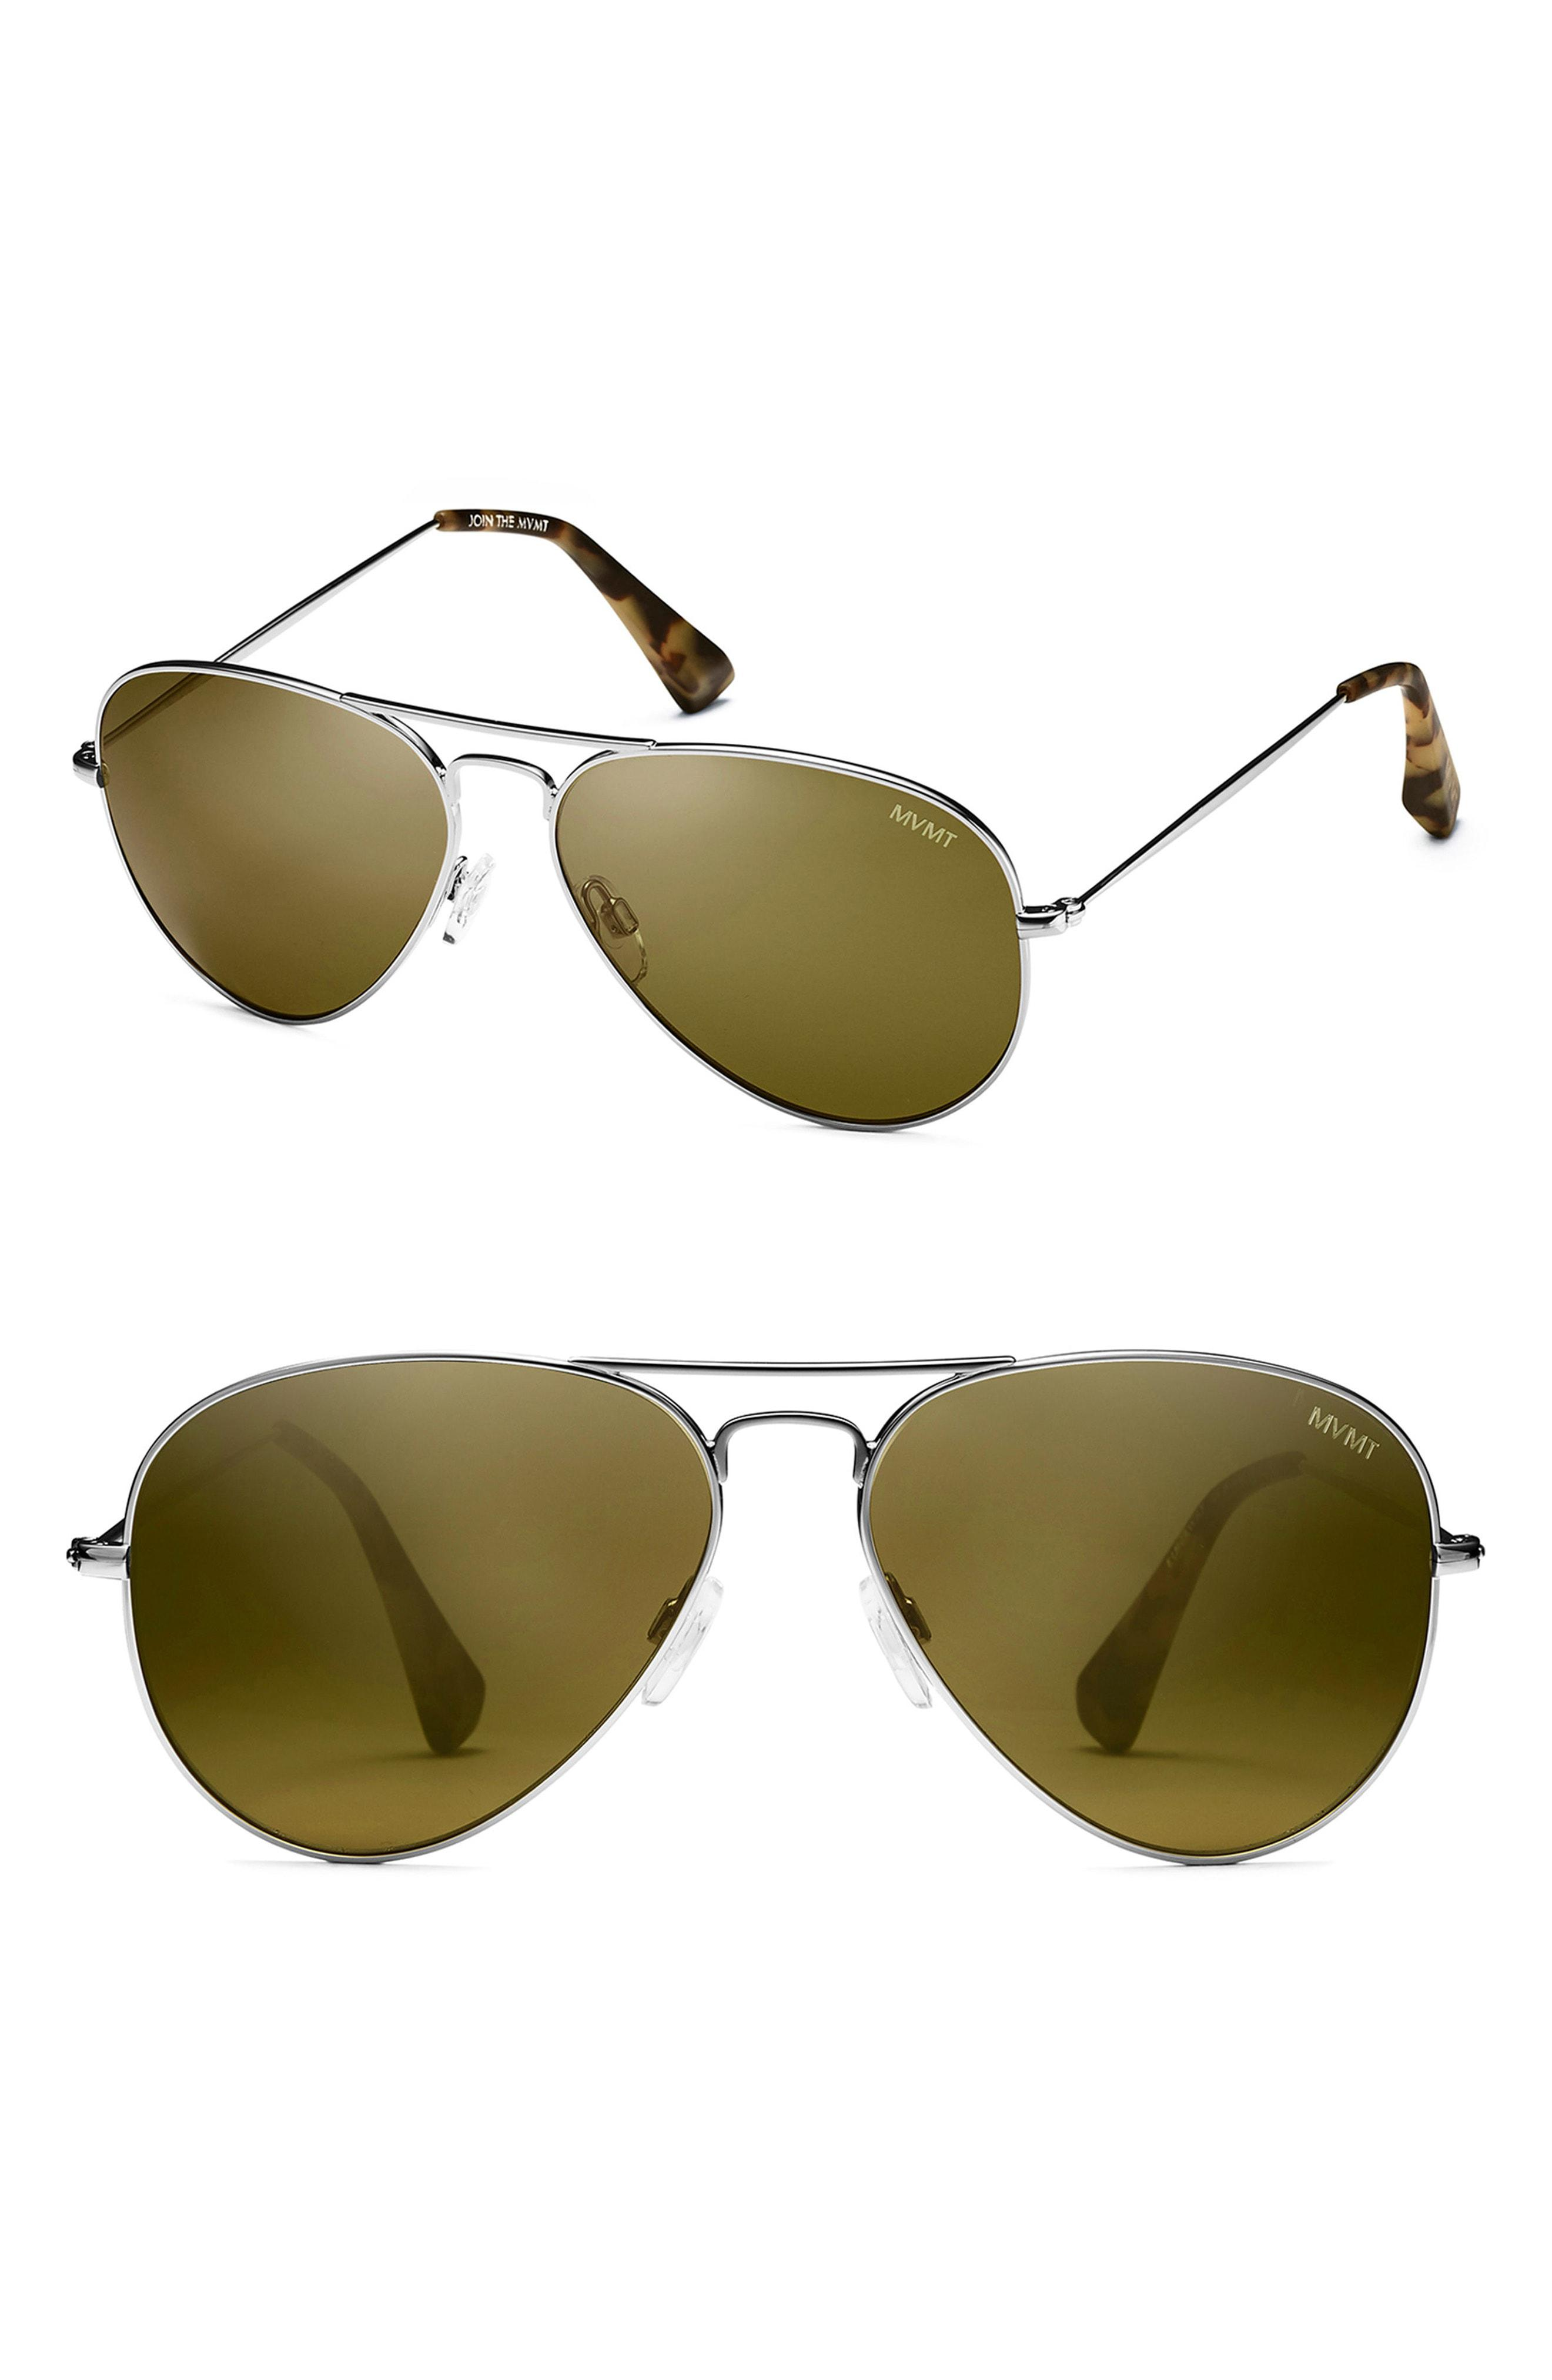 926745f821 MVMT - Green Runway 60mm Polarized Aviator Sunglasses - for Men - Lyst.  View fullscreen